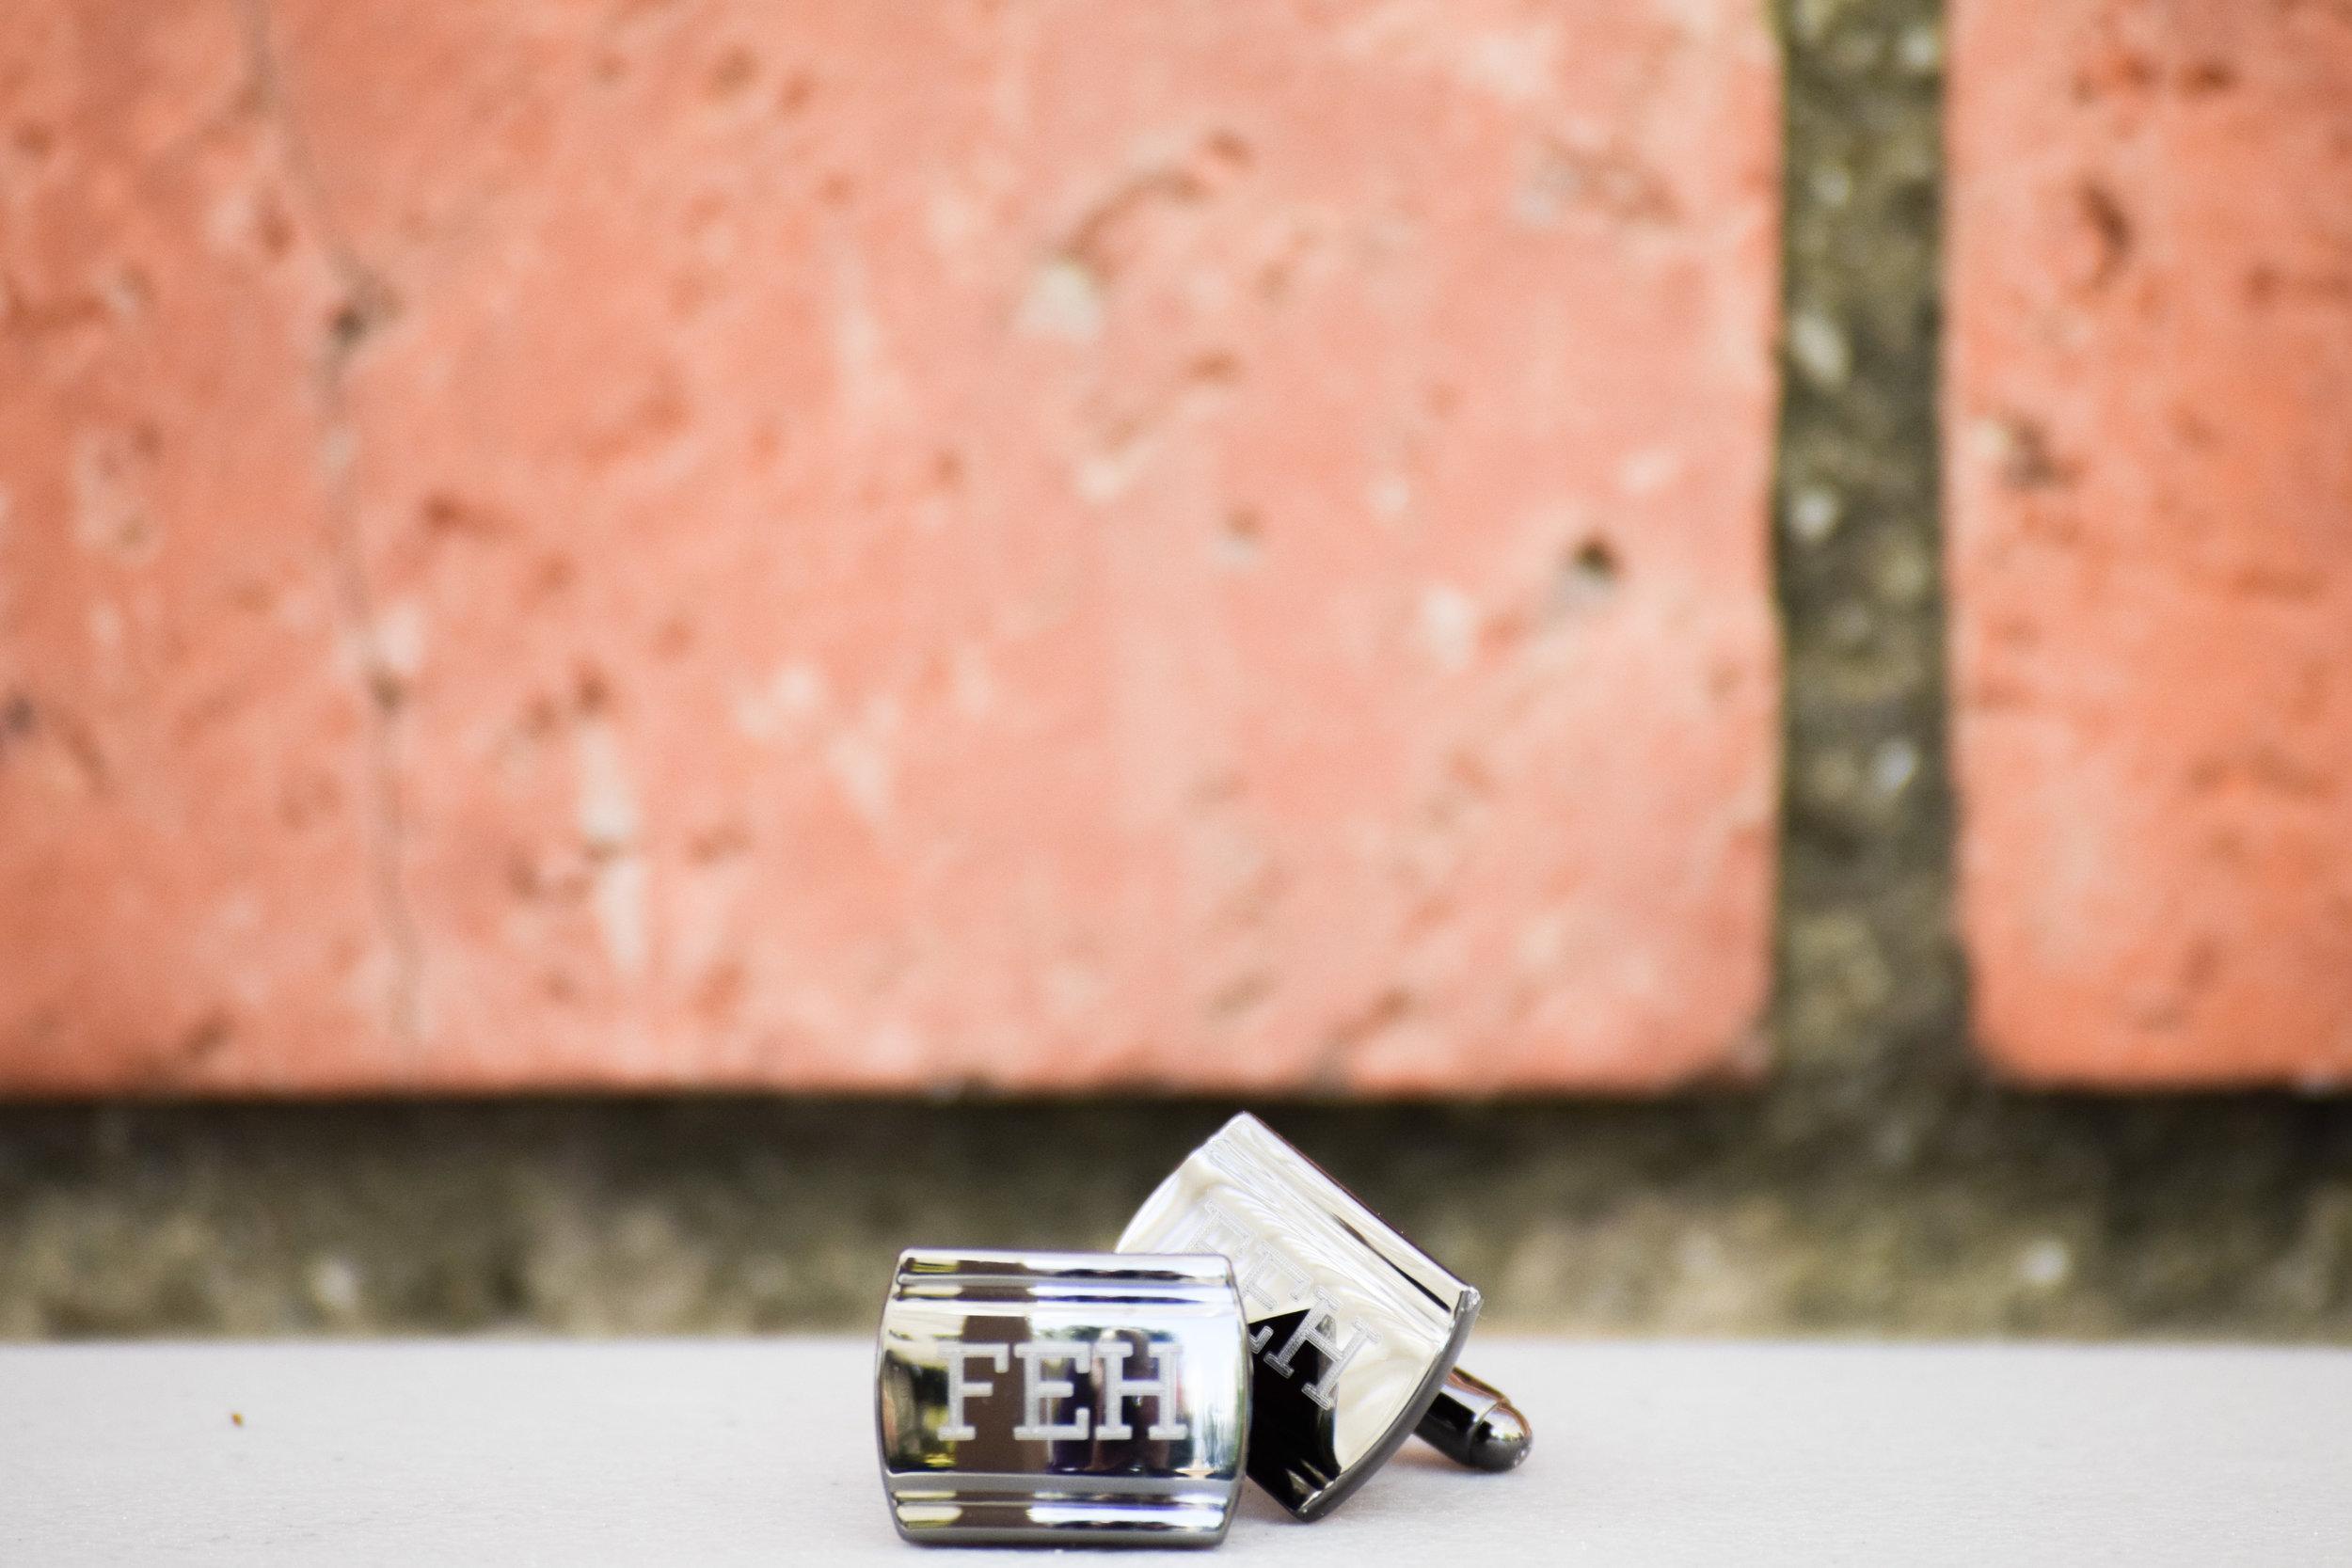 Groomsman Proposal Gift Ideas -- Engraved Groomsman Cuff Links - Things Remembered